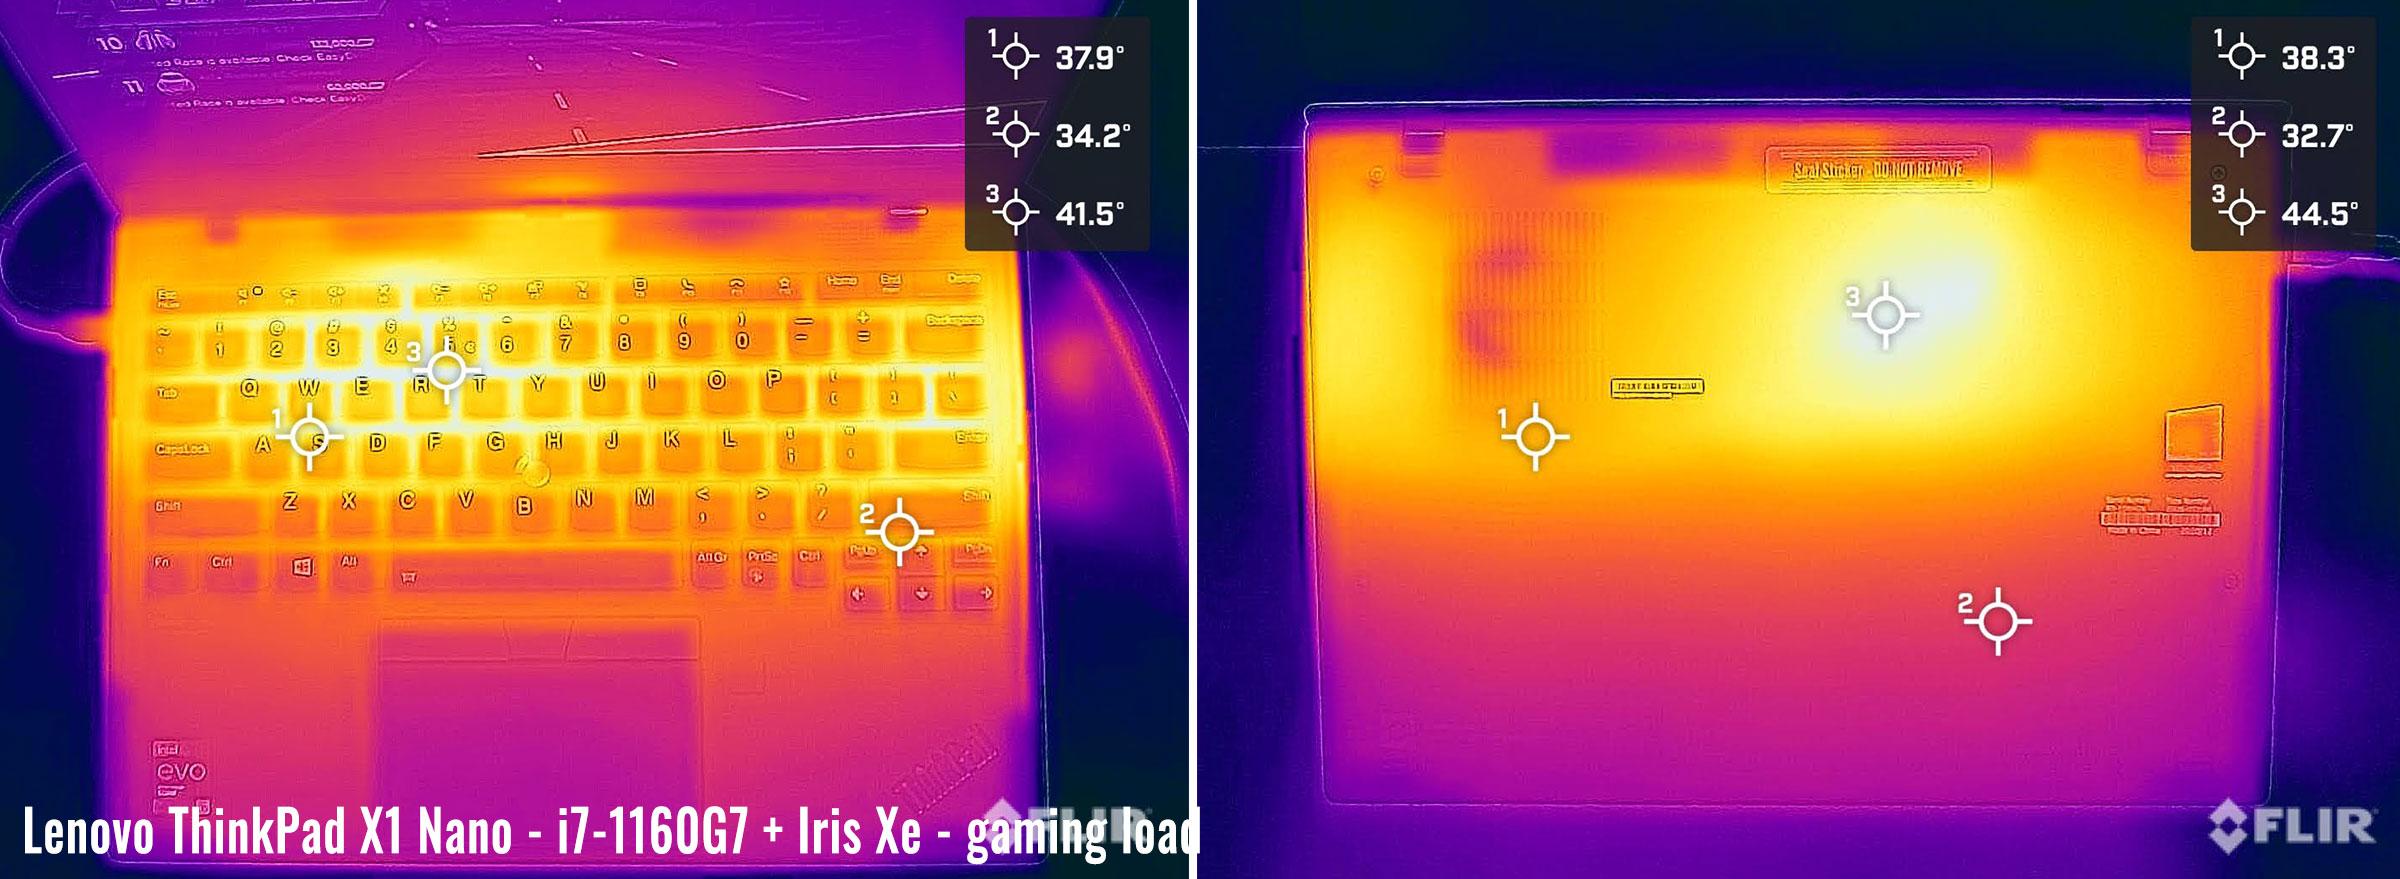 temps thinkpad x1 nano gaming